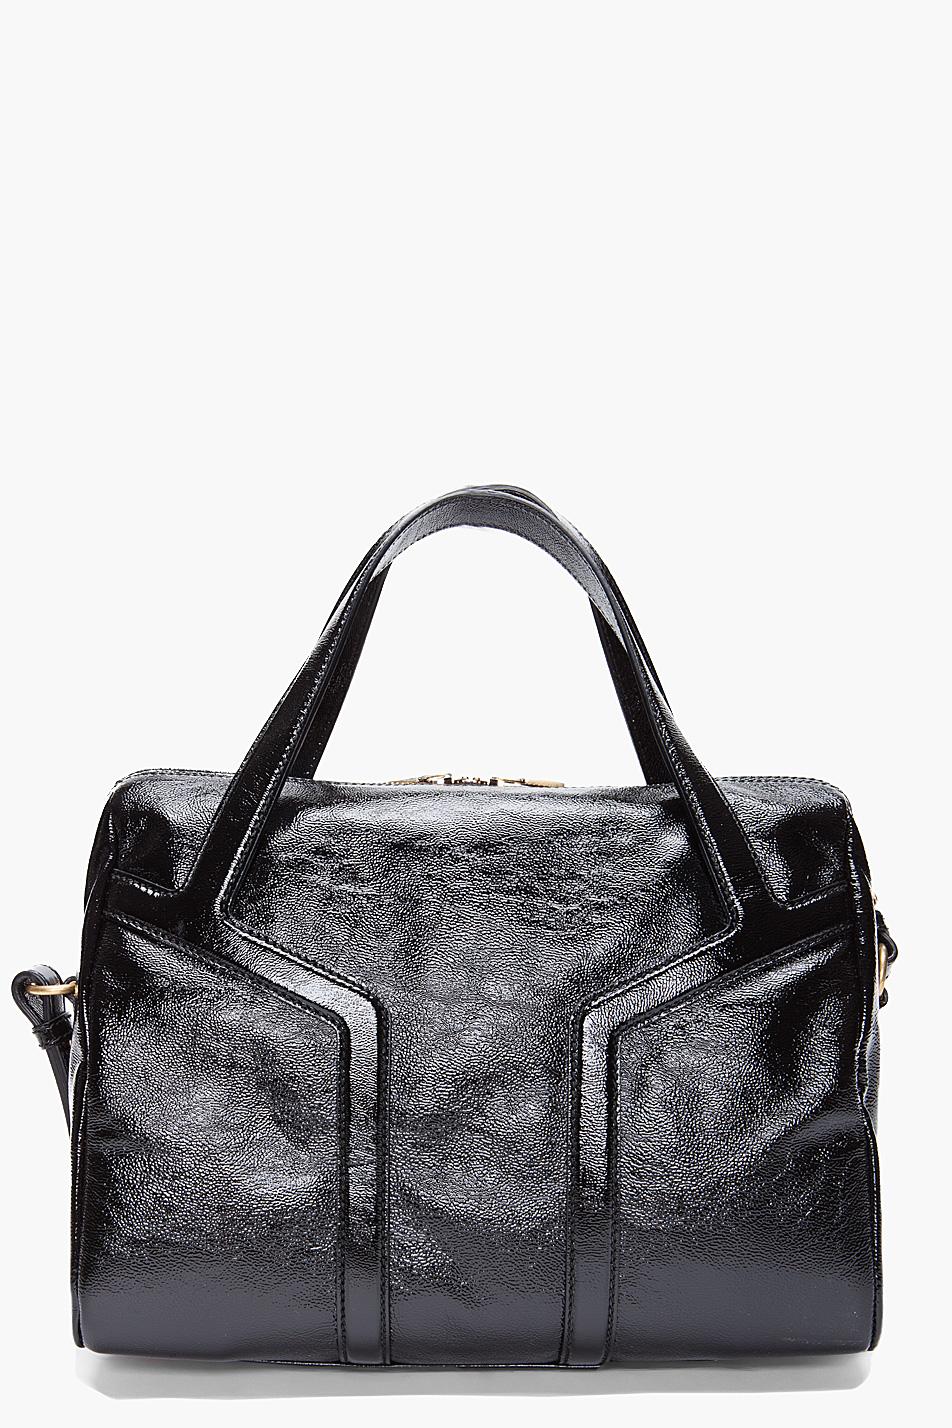 replica clutch - yves saint laurent opium shoulder bag, yves st.laurent purses